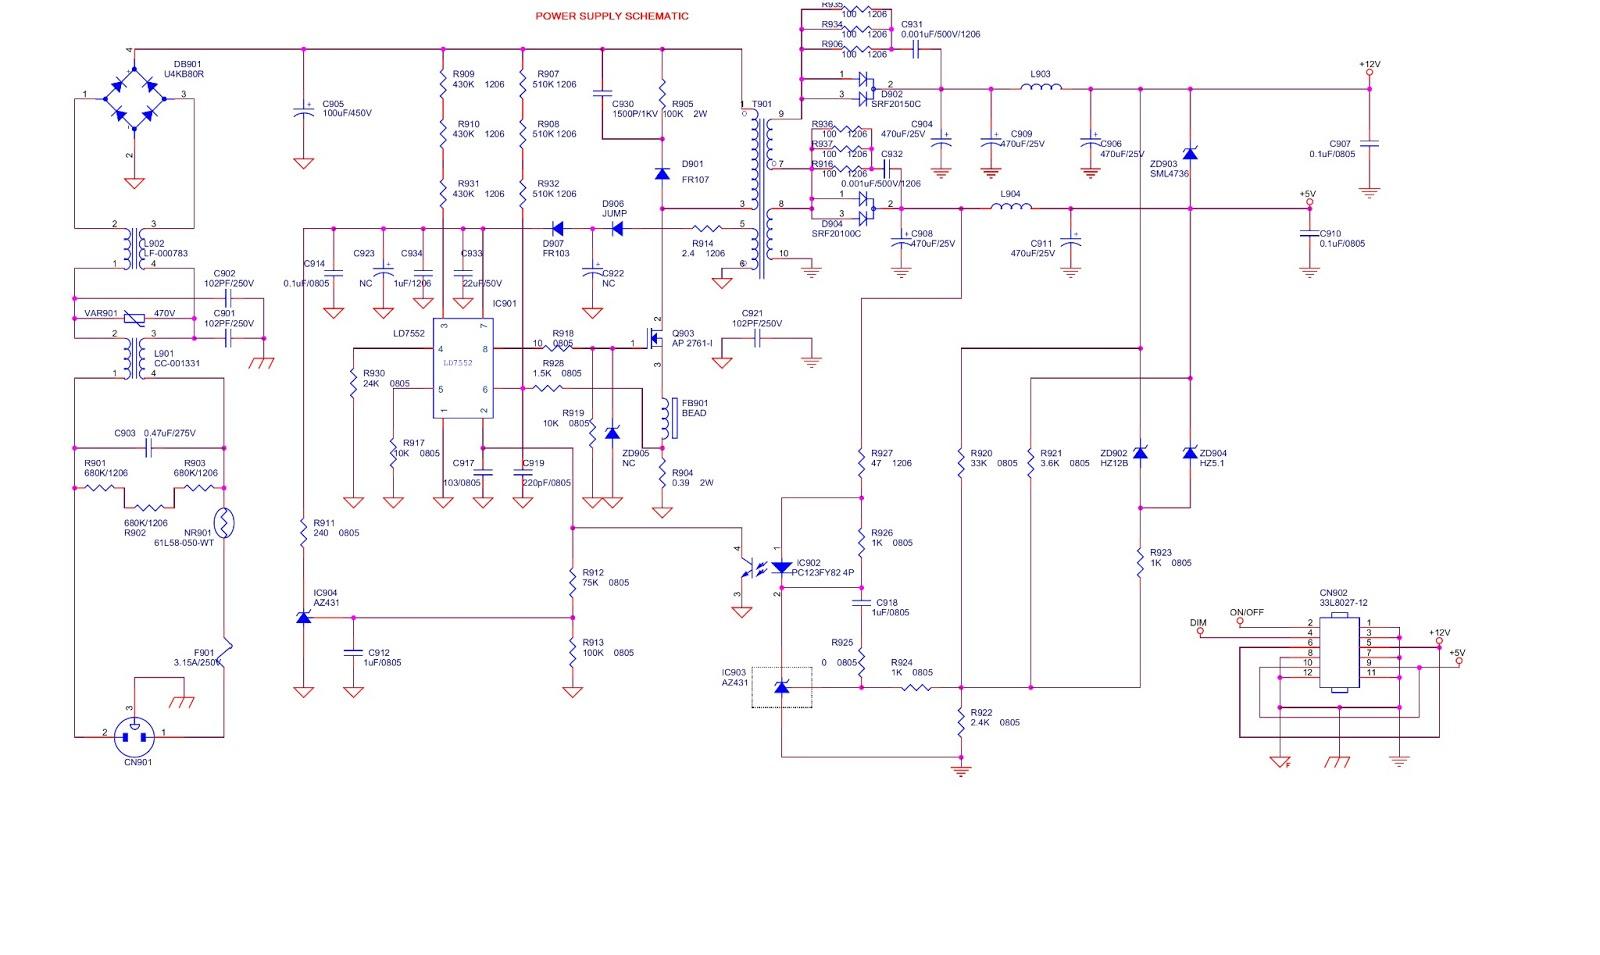 HP VS19E AOC  19 INCH LCD MONITOR  POWER SUPPLY  SCHEMATIC DIAGRAM | Electro help